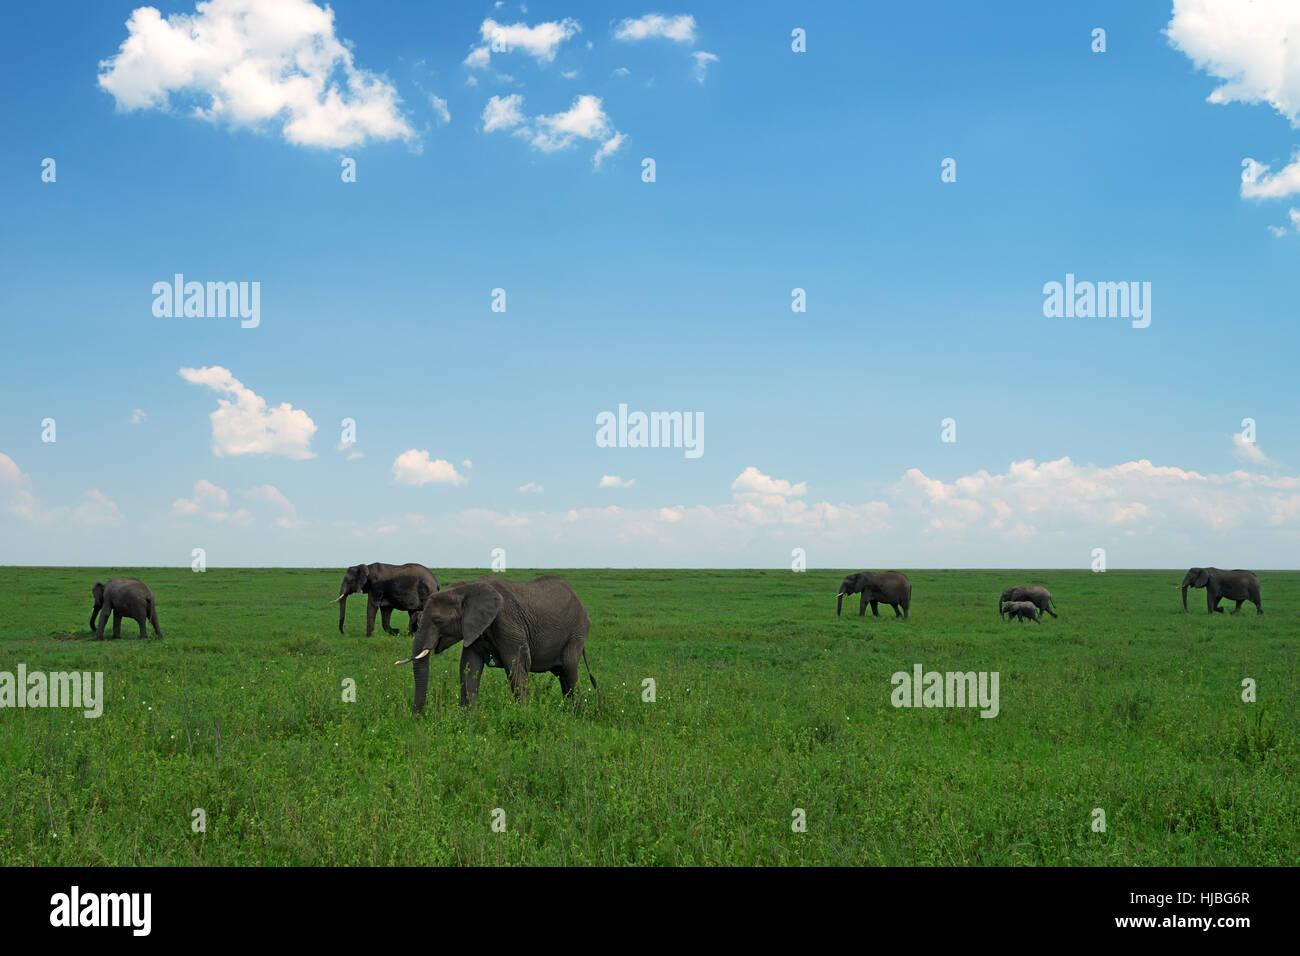 Grupo de elefantes africanos en la sabana Foto de stock